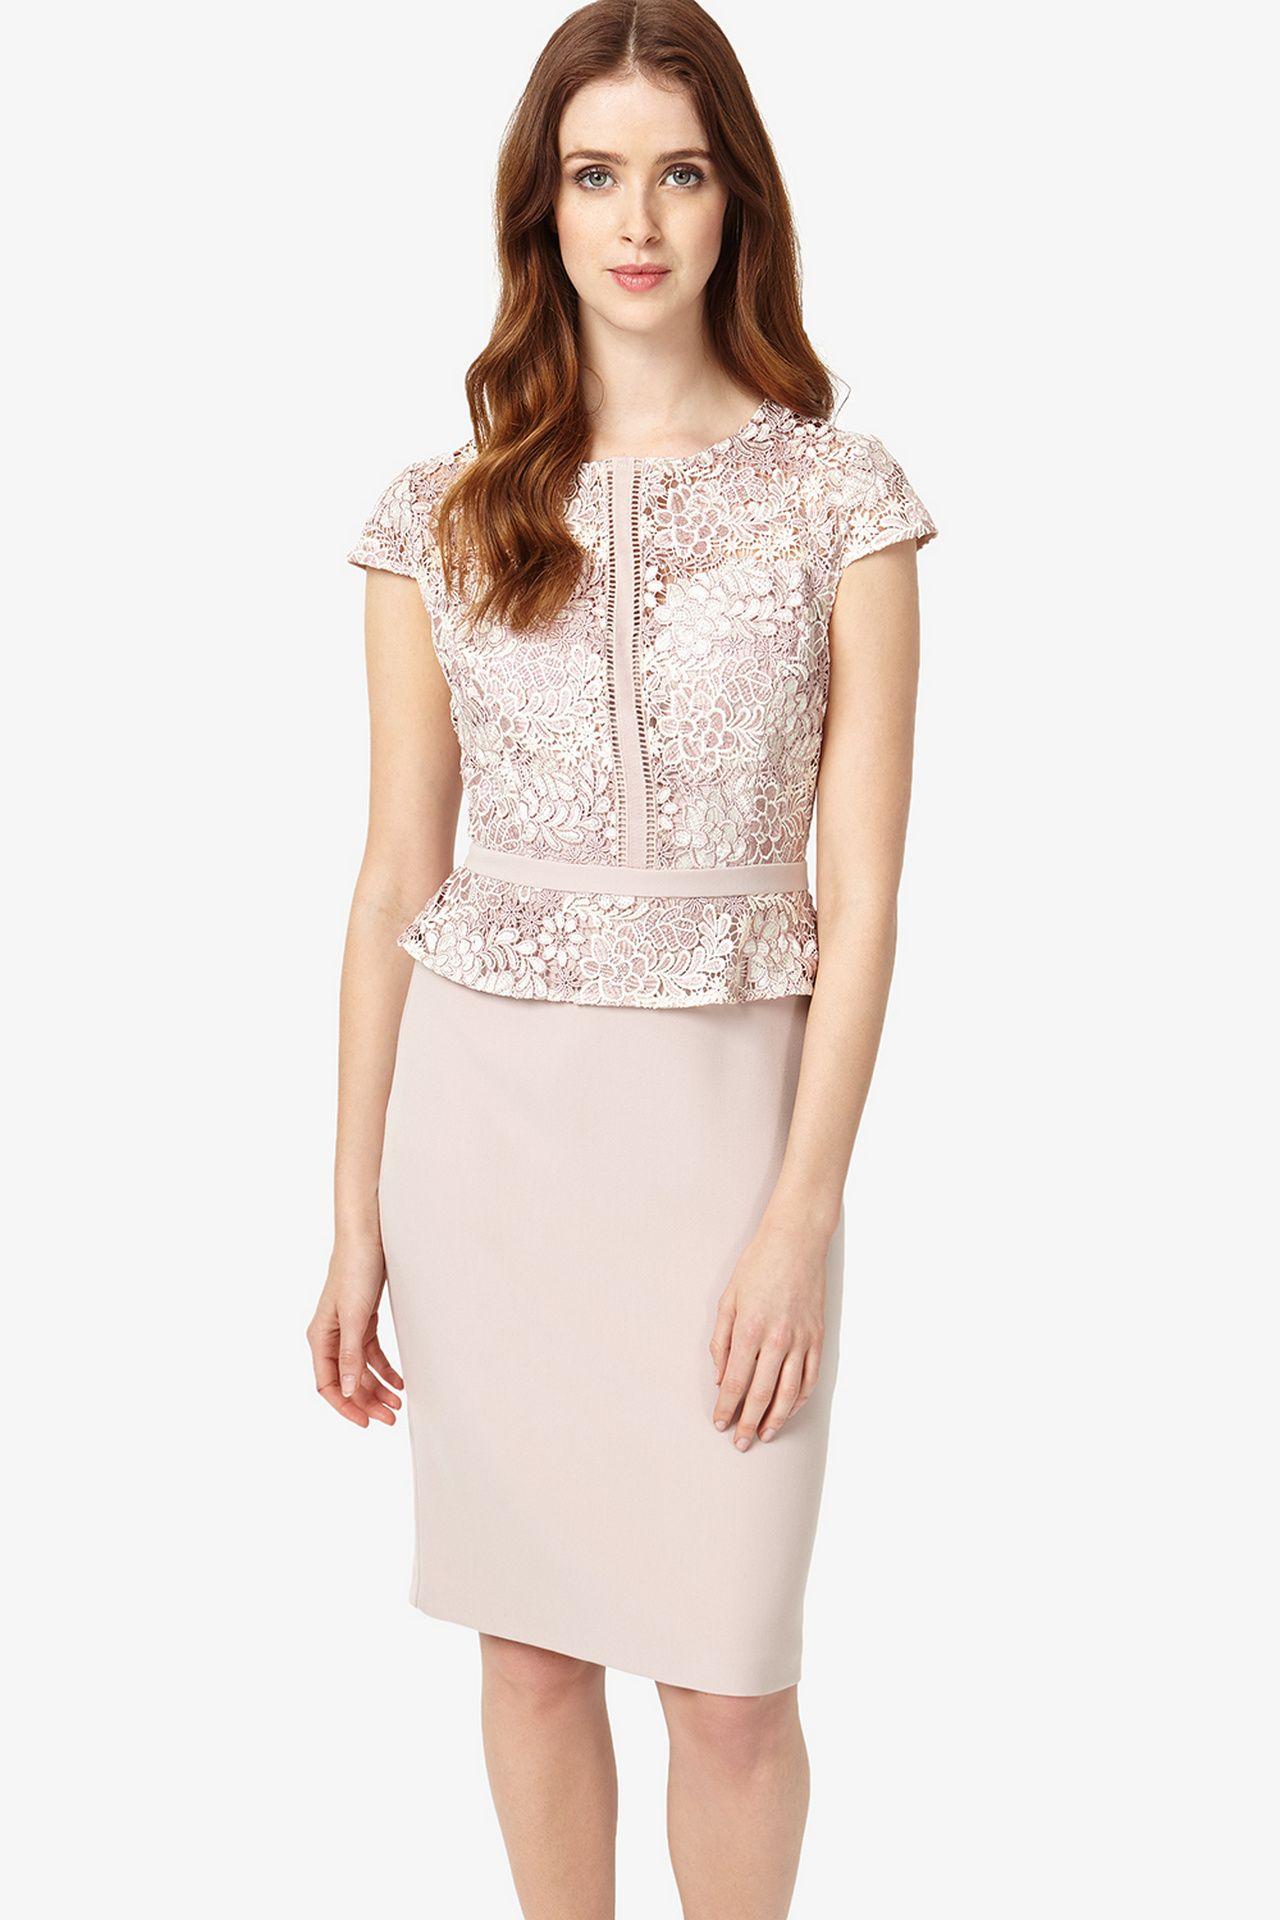 Sheath dresses for wedding guest  jurk met kant en peplum effect  Fashion  Pinterest  Met Vans and